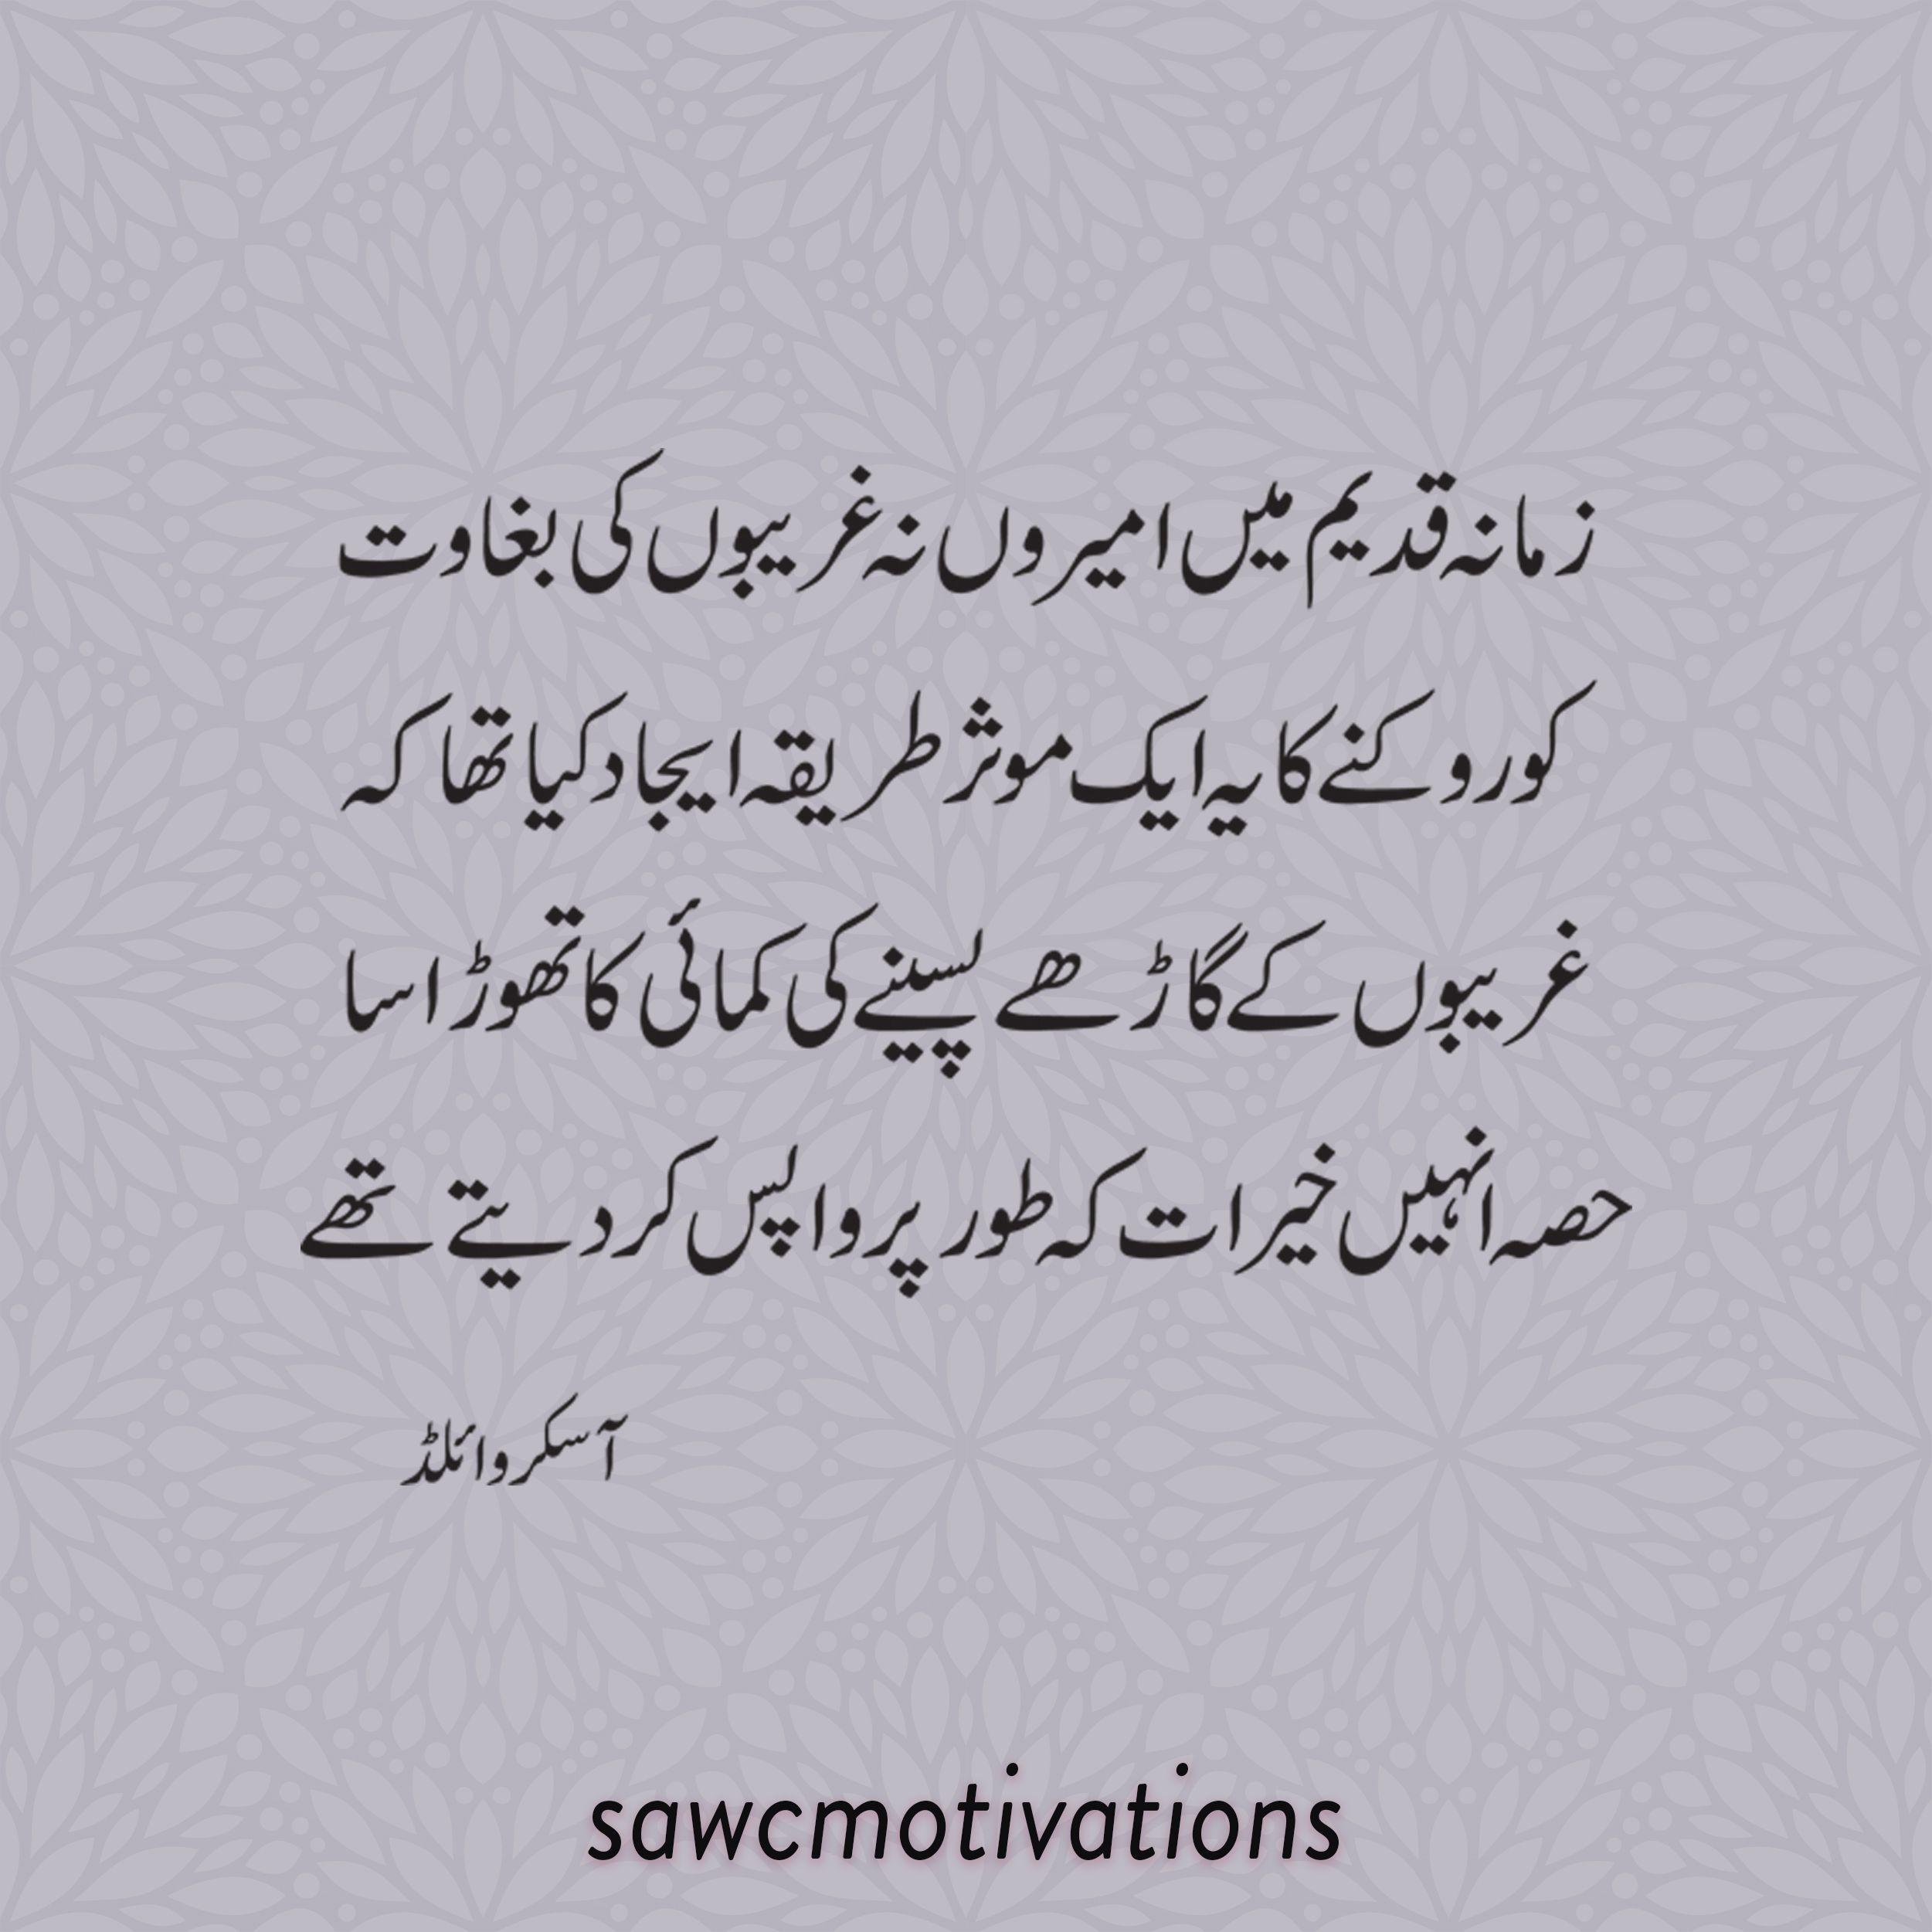 Quotes In Urdu Philosophy Sawcmotivations Quotes Urdu Quotes Philosophy